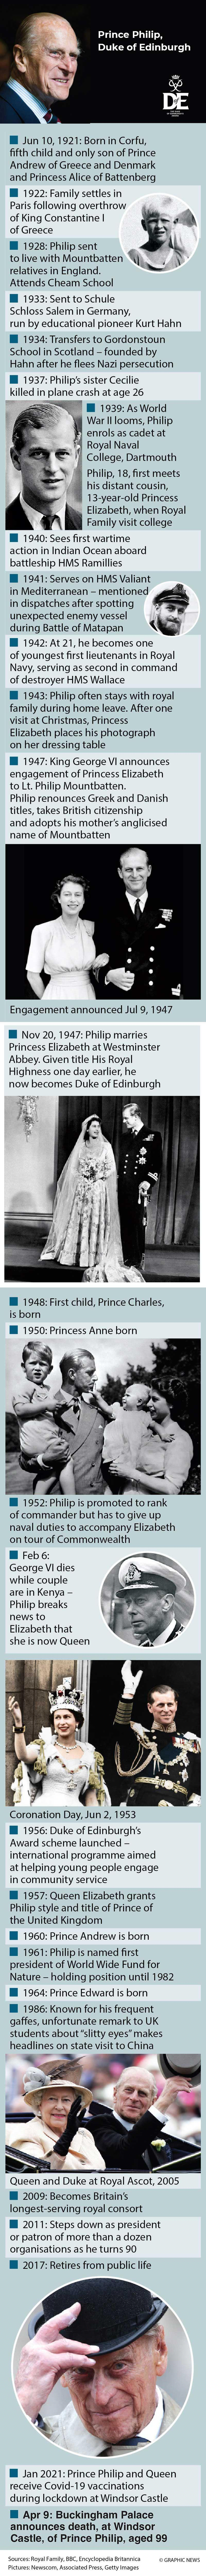 20210411 Prince Philip